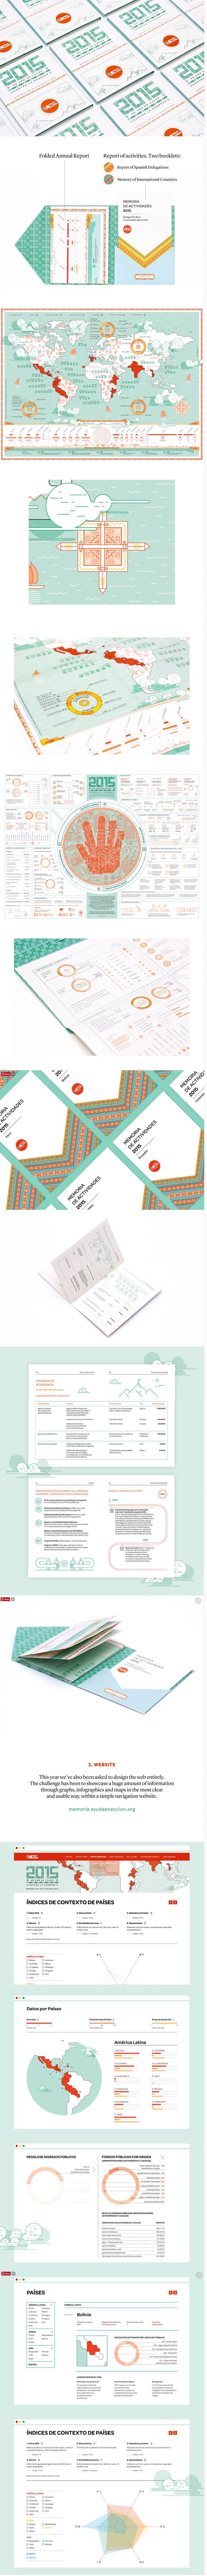 https://www.behance.net/gallery/52031553/Ayuda-en-Accion-2015-Annual-Report